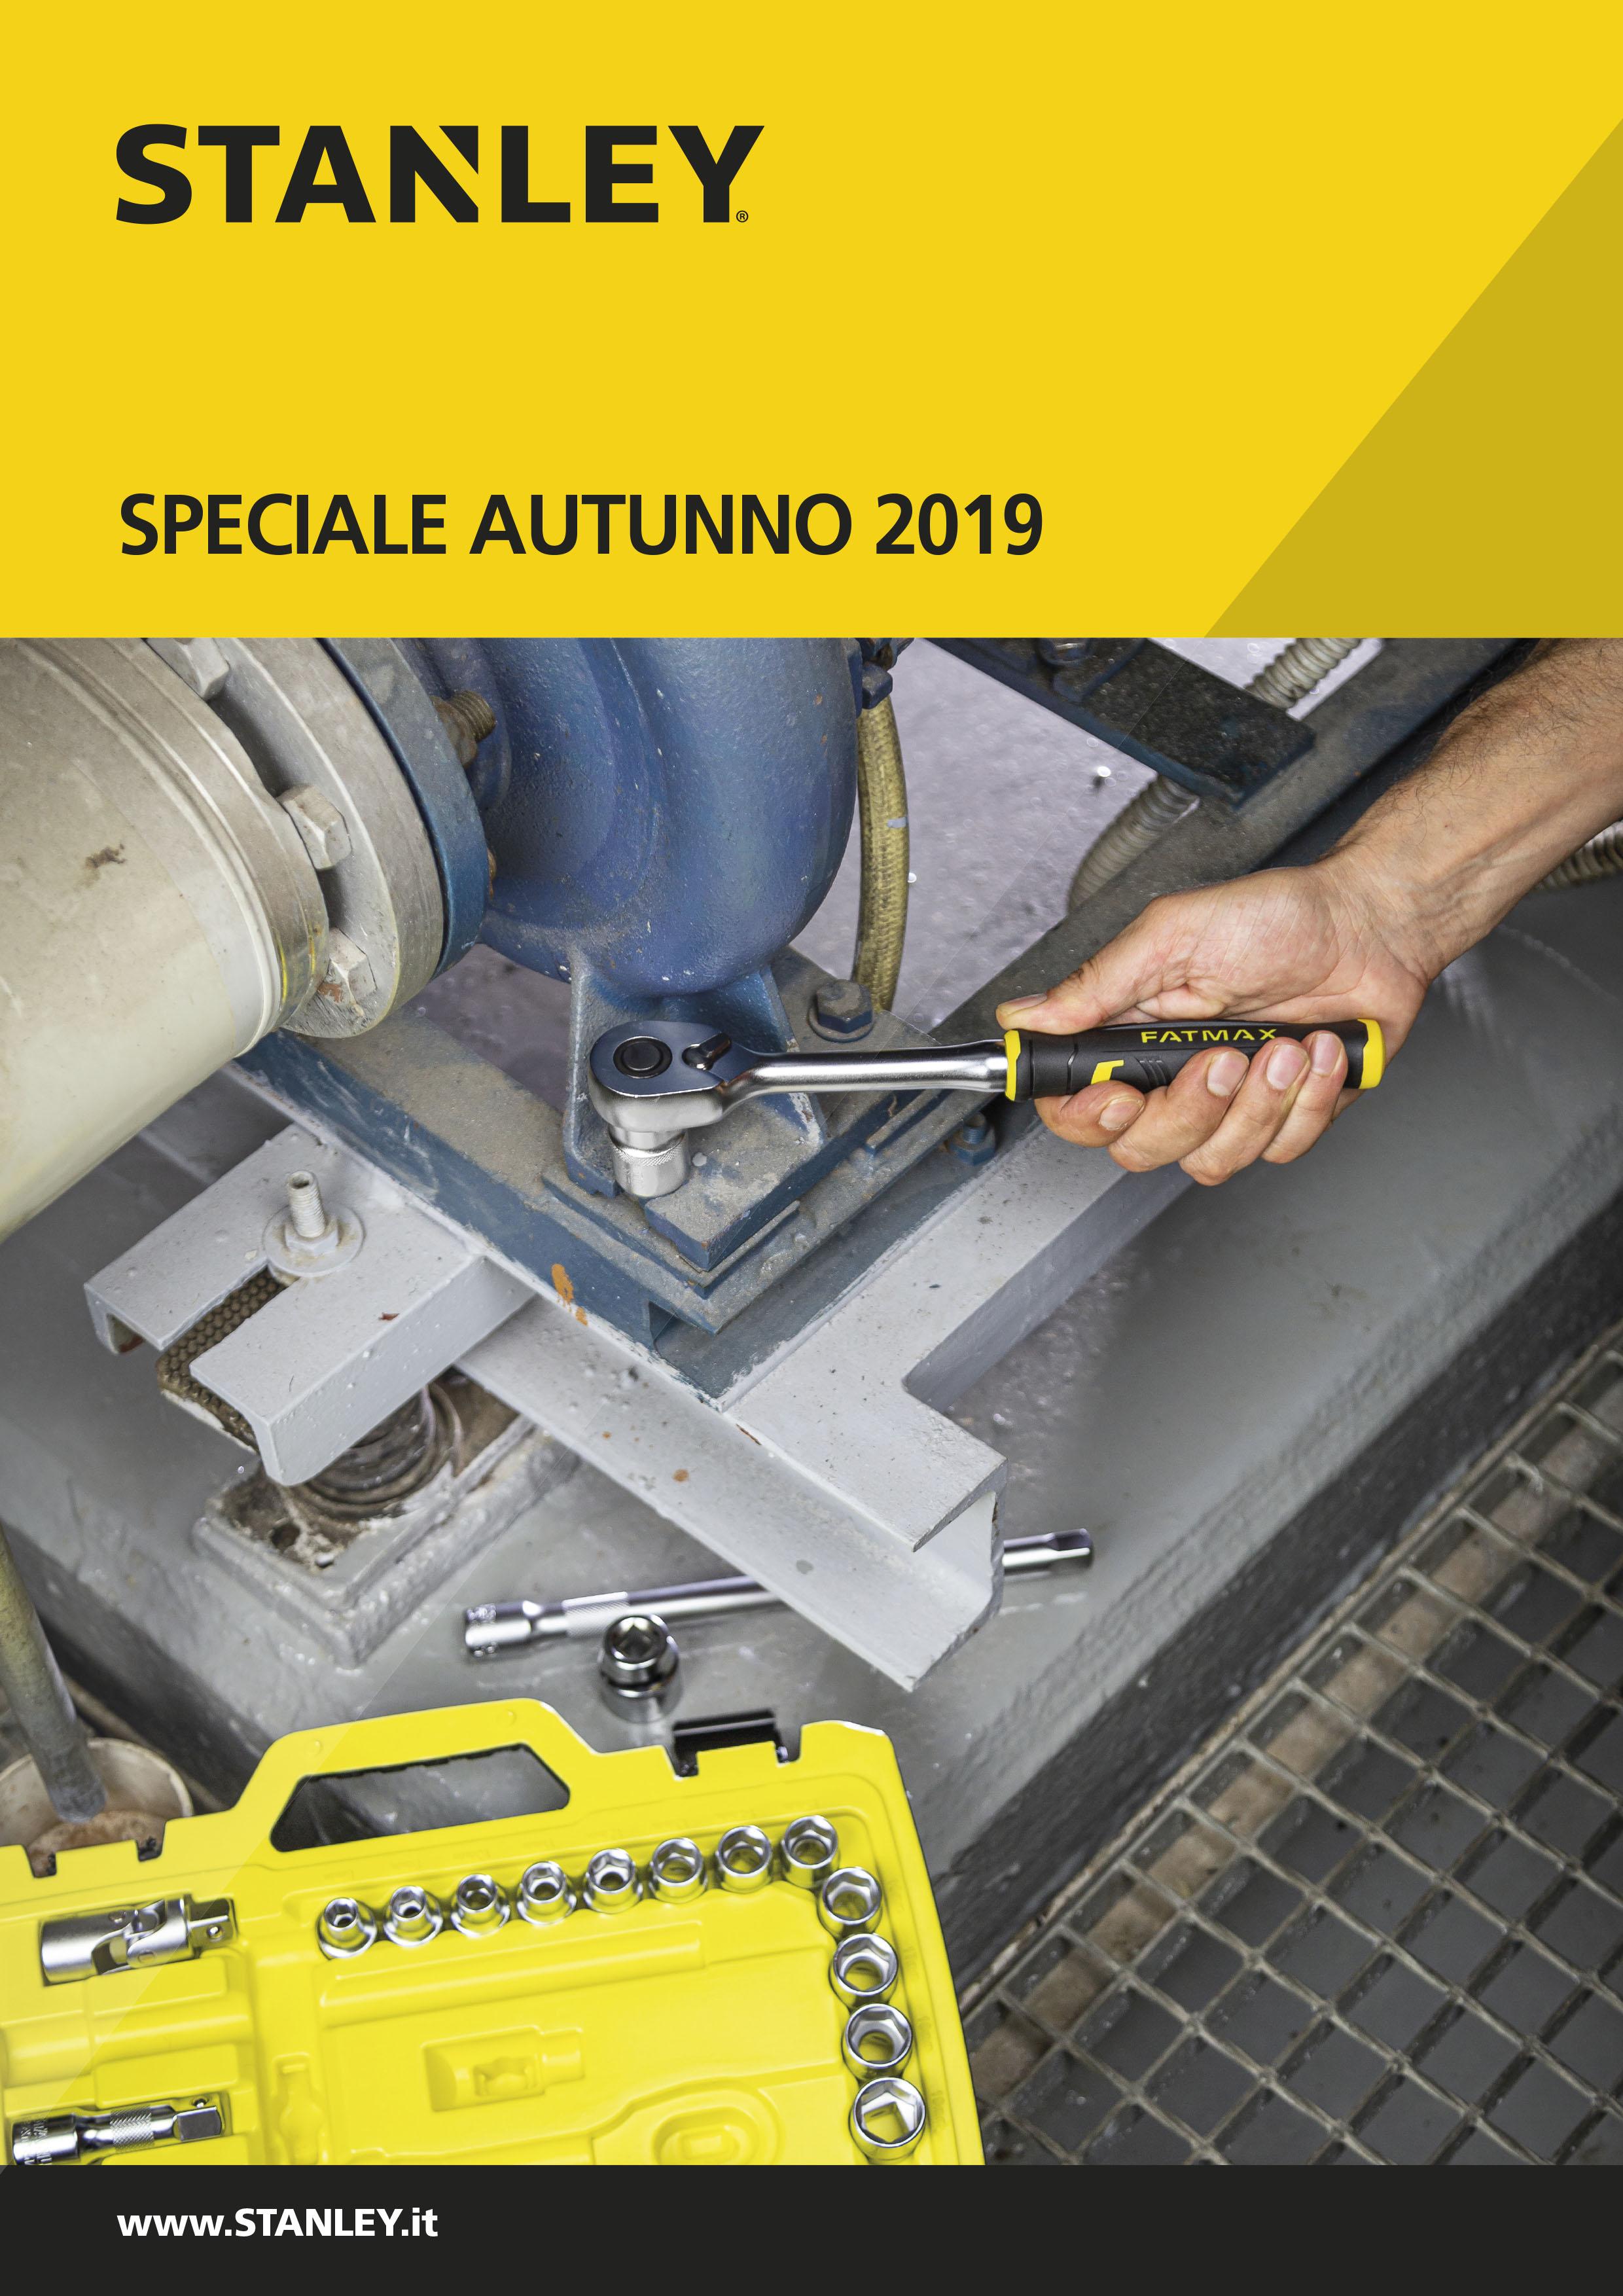 Depliant Speciale Autunno 2019